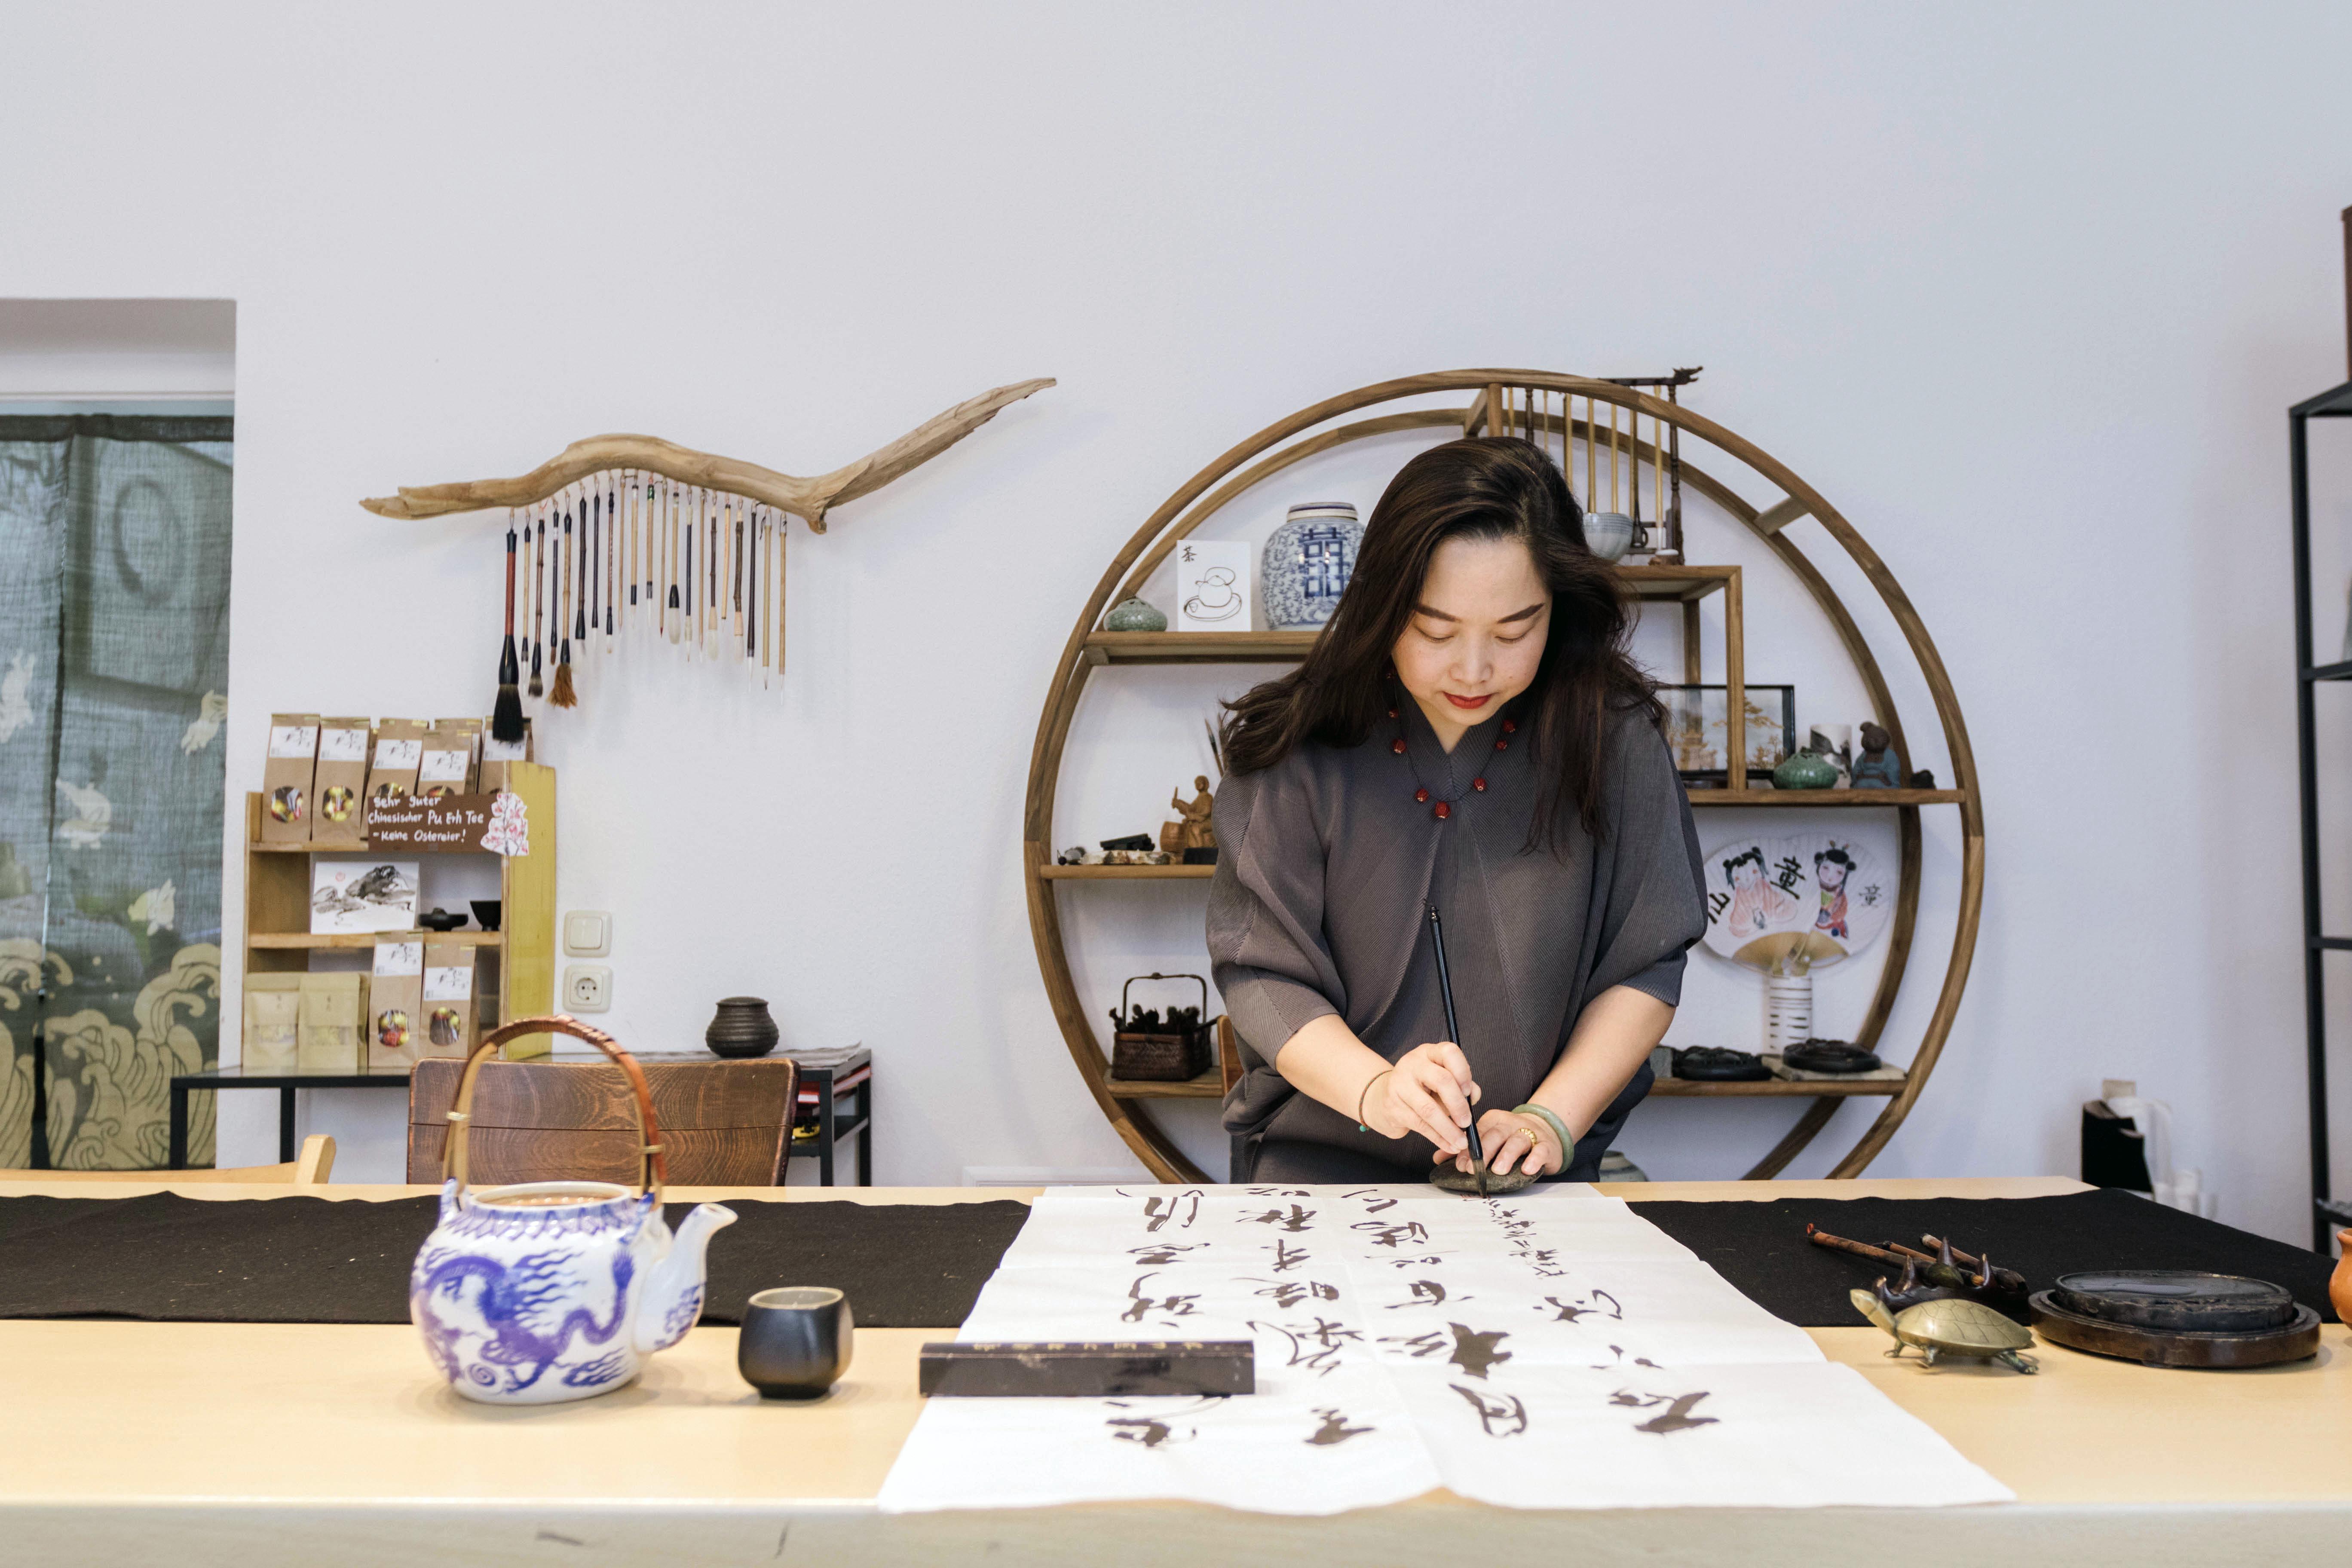 Yini Tao Atelier